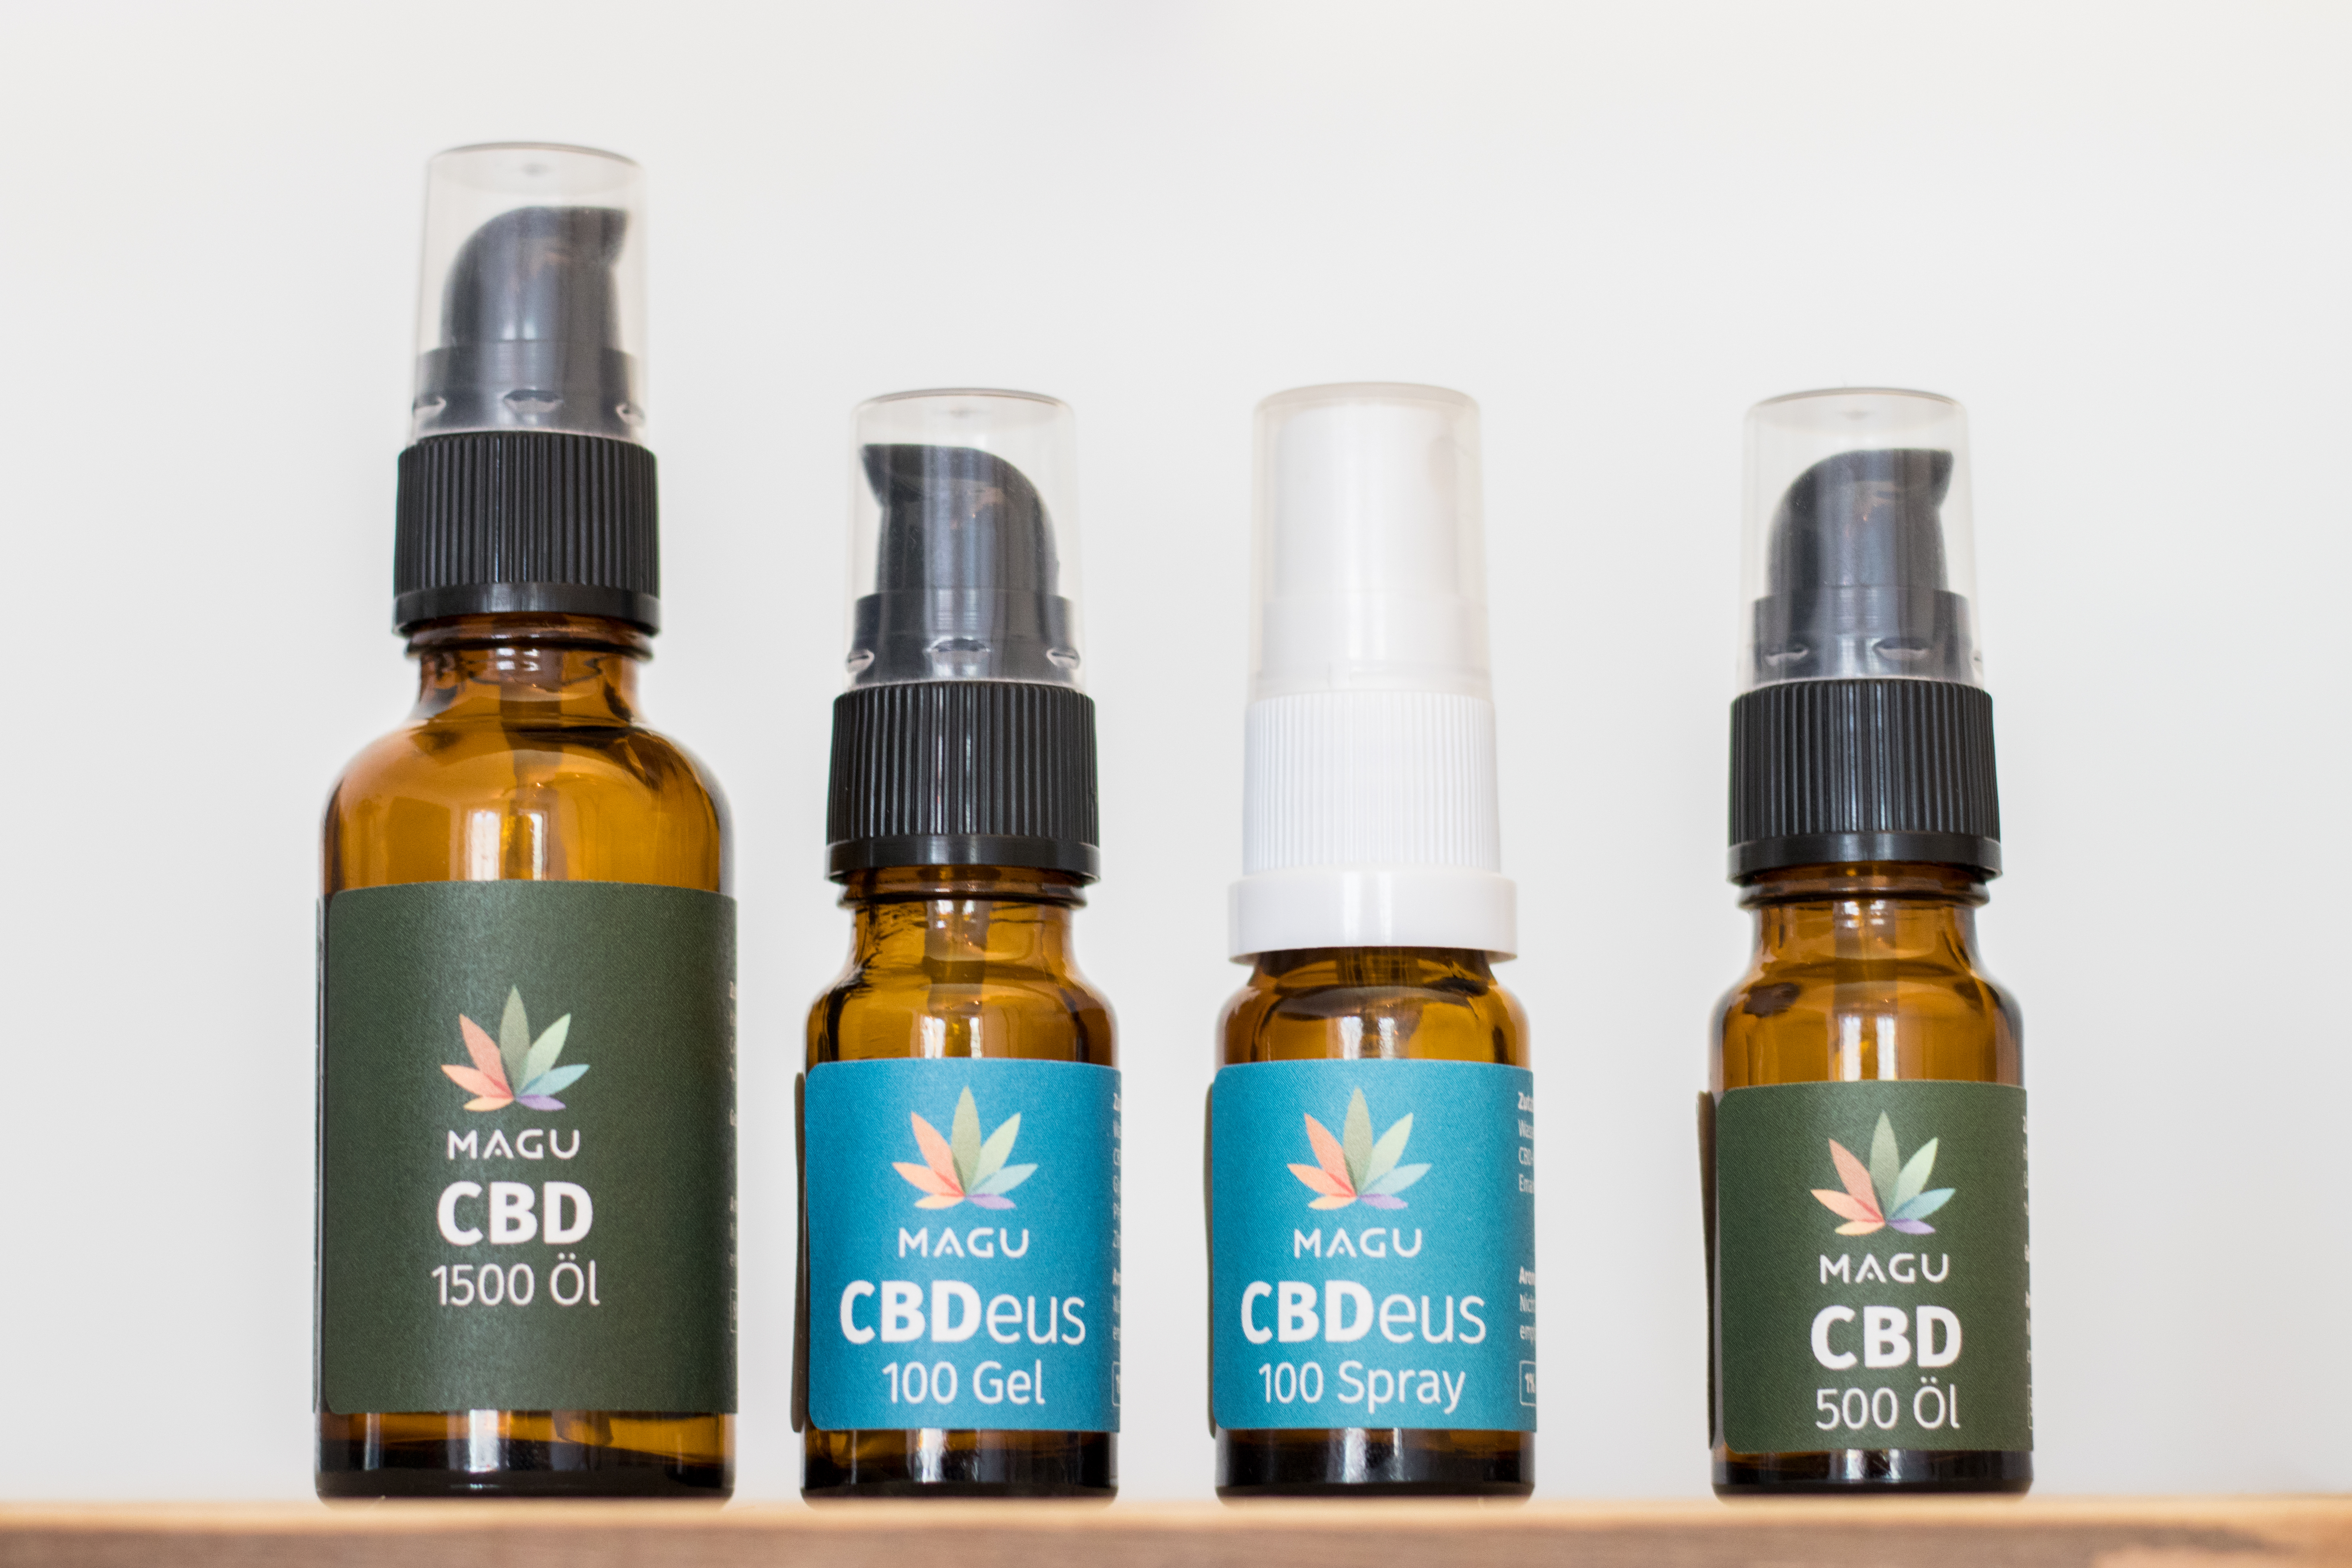 CBDeus & CBD Öl